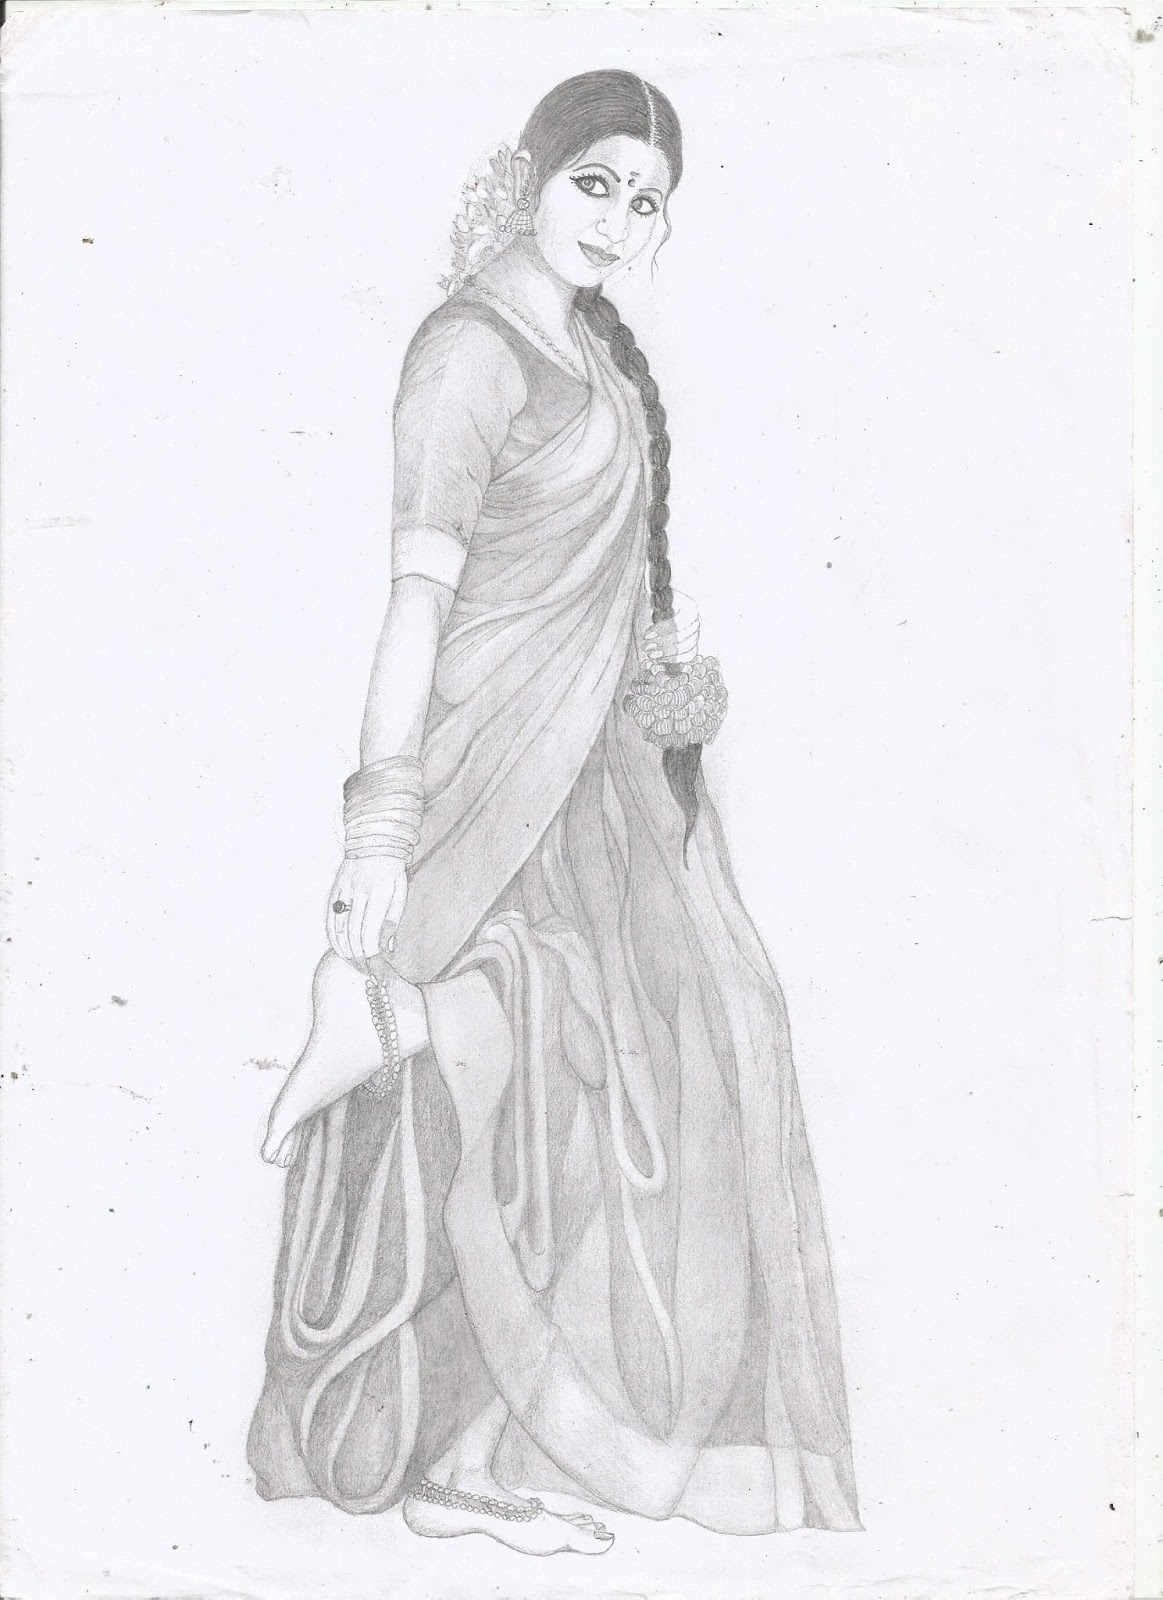 Jackhi pencil drawing indian women pencil sketch